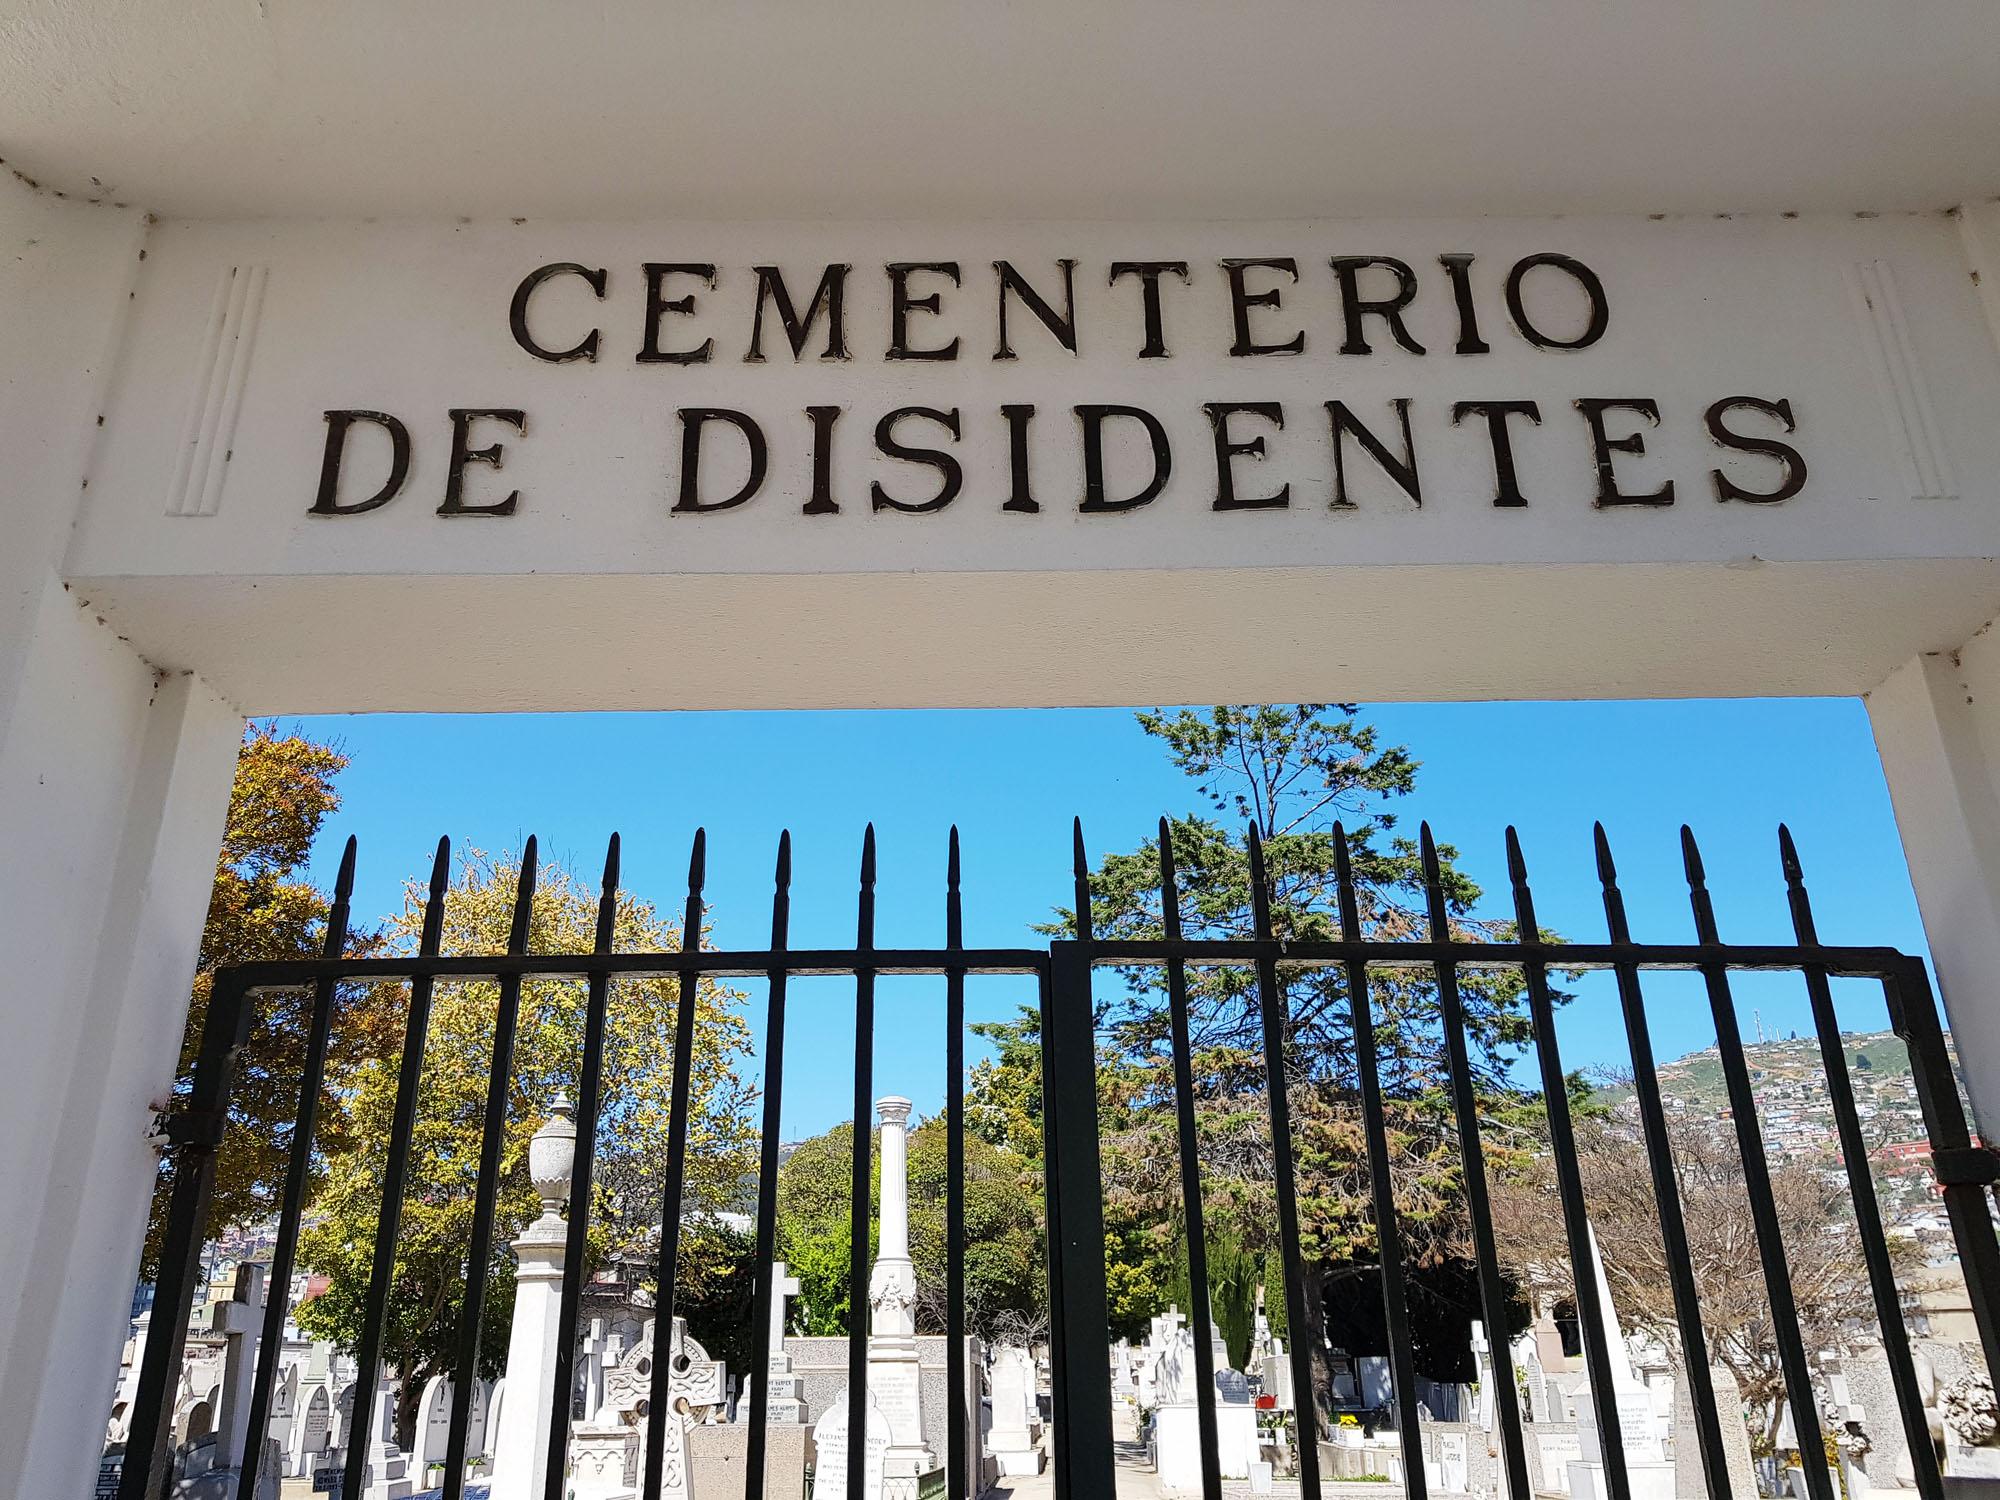 Eingang Dissidentenfriedhof am Cerro (Hügel) Bellavista in Valparaiso